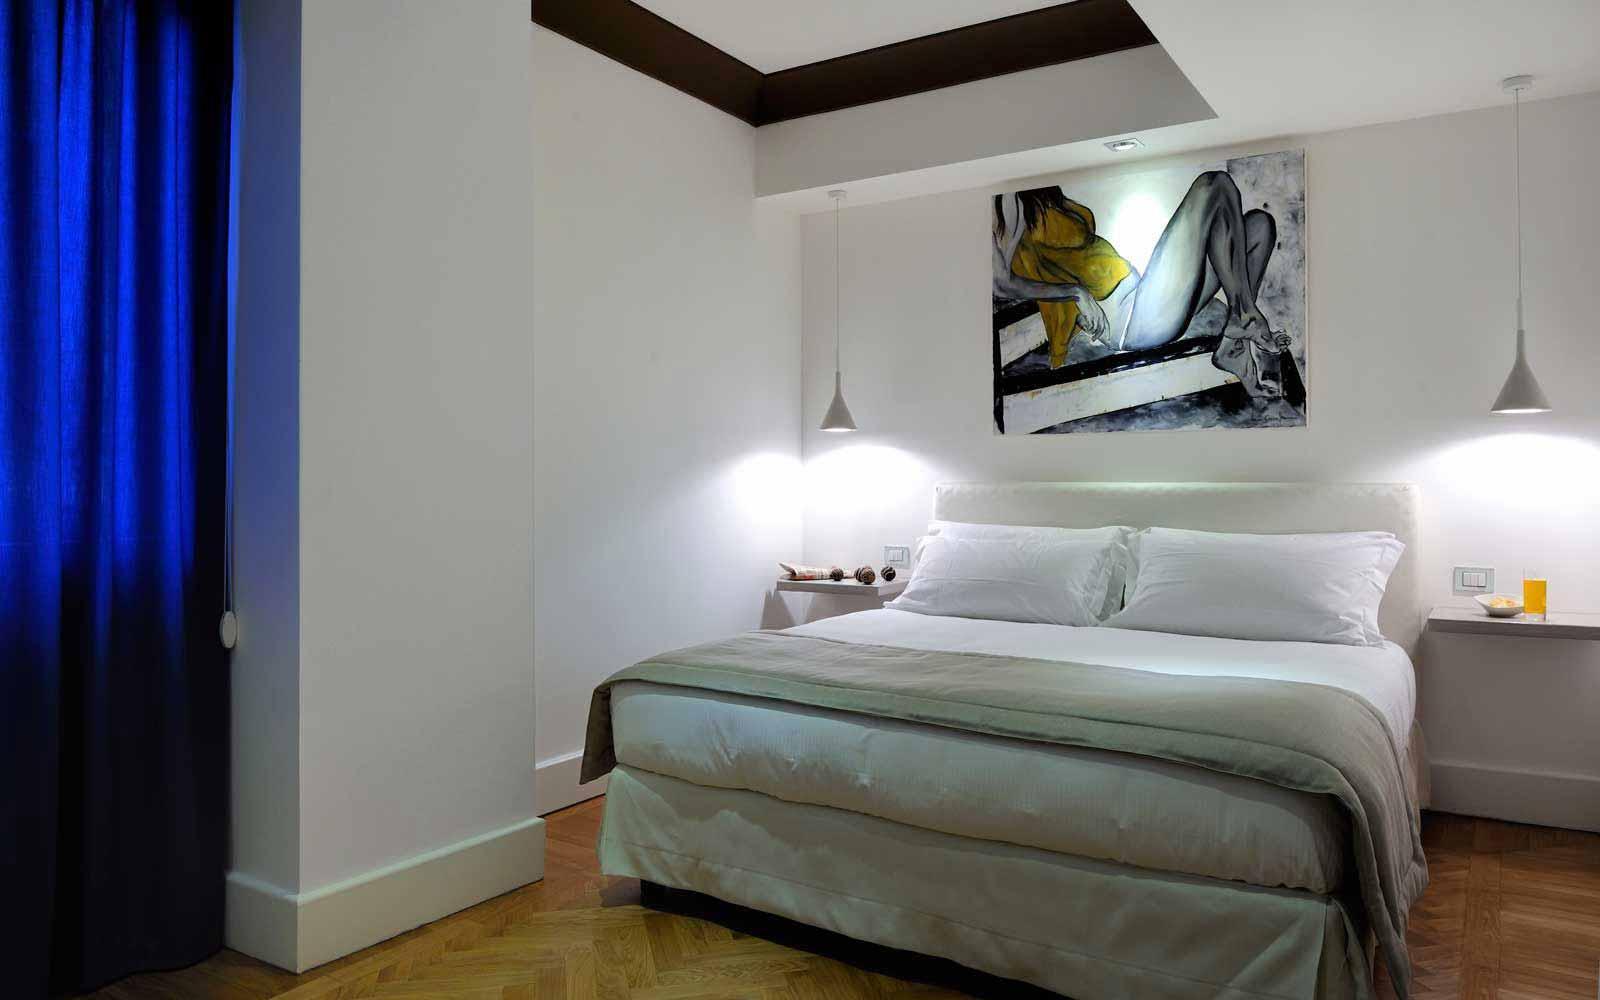 Superior room at Hotel Principe Di Villafranca